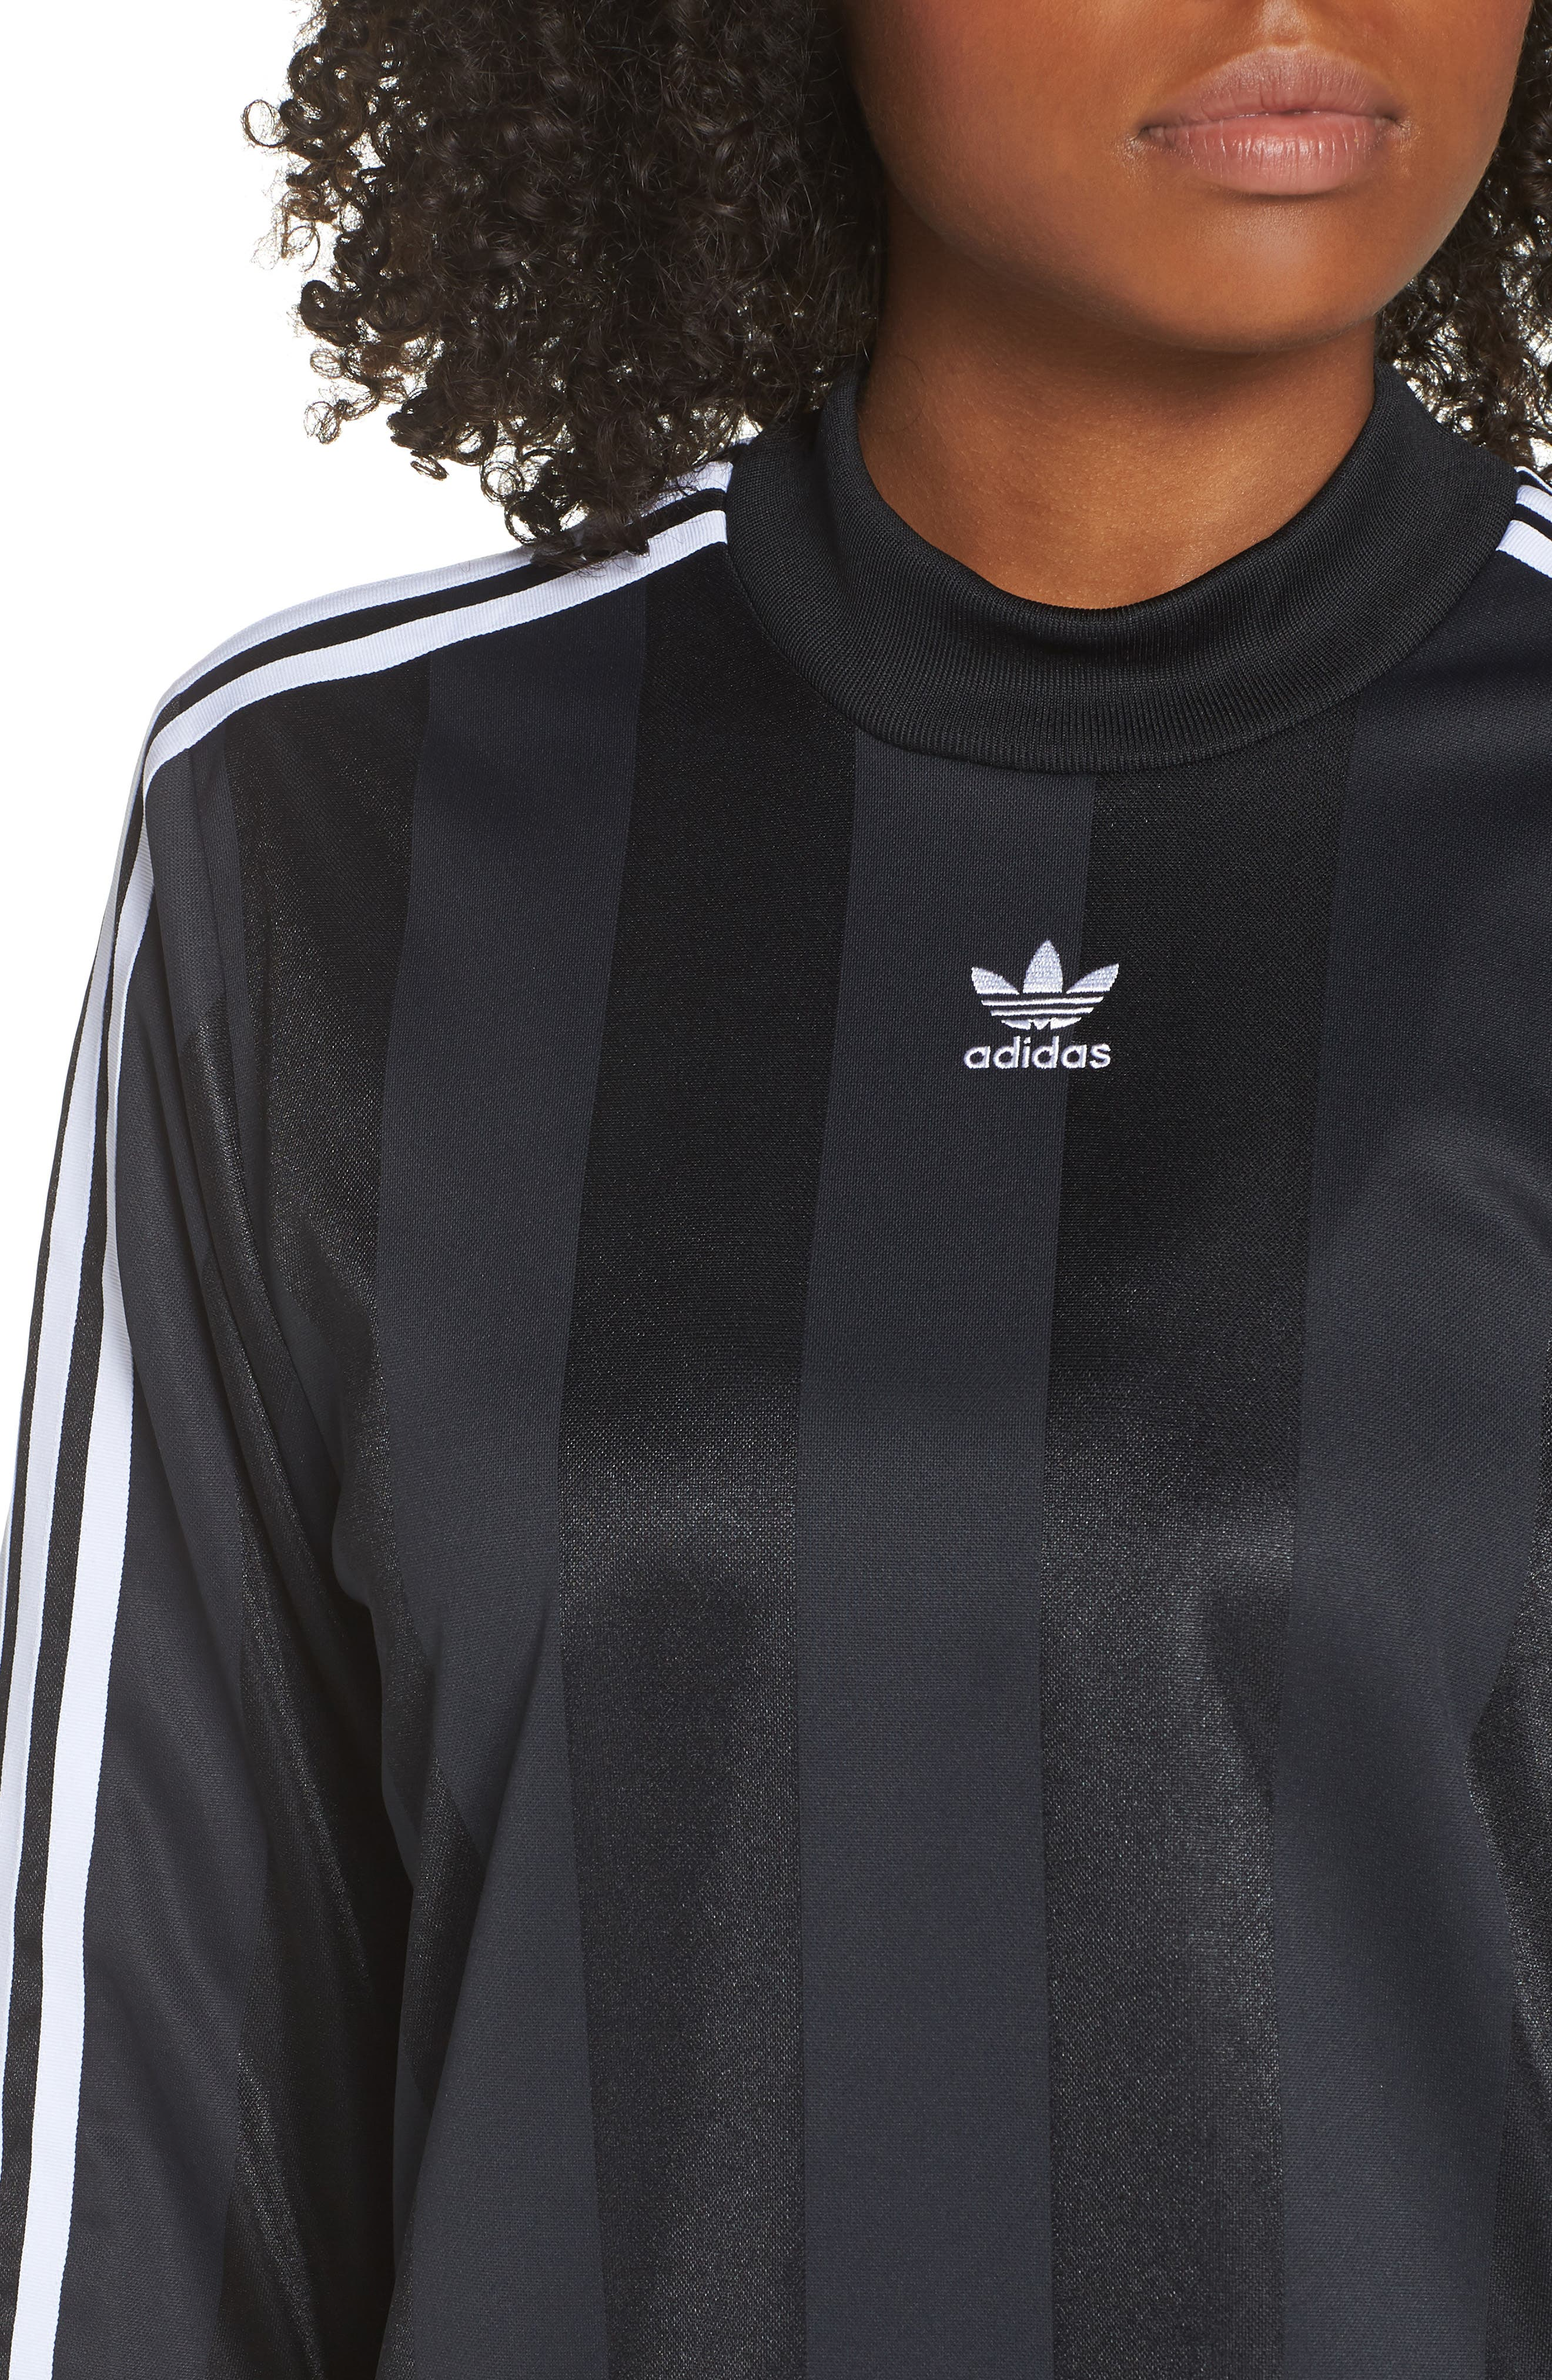 adidas 3-Stripes Long Sleeve Tee,                             Alternate thumbnail 4, color,                             001